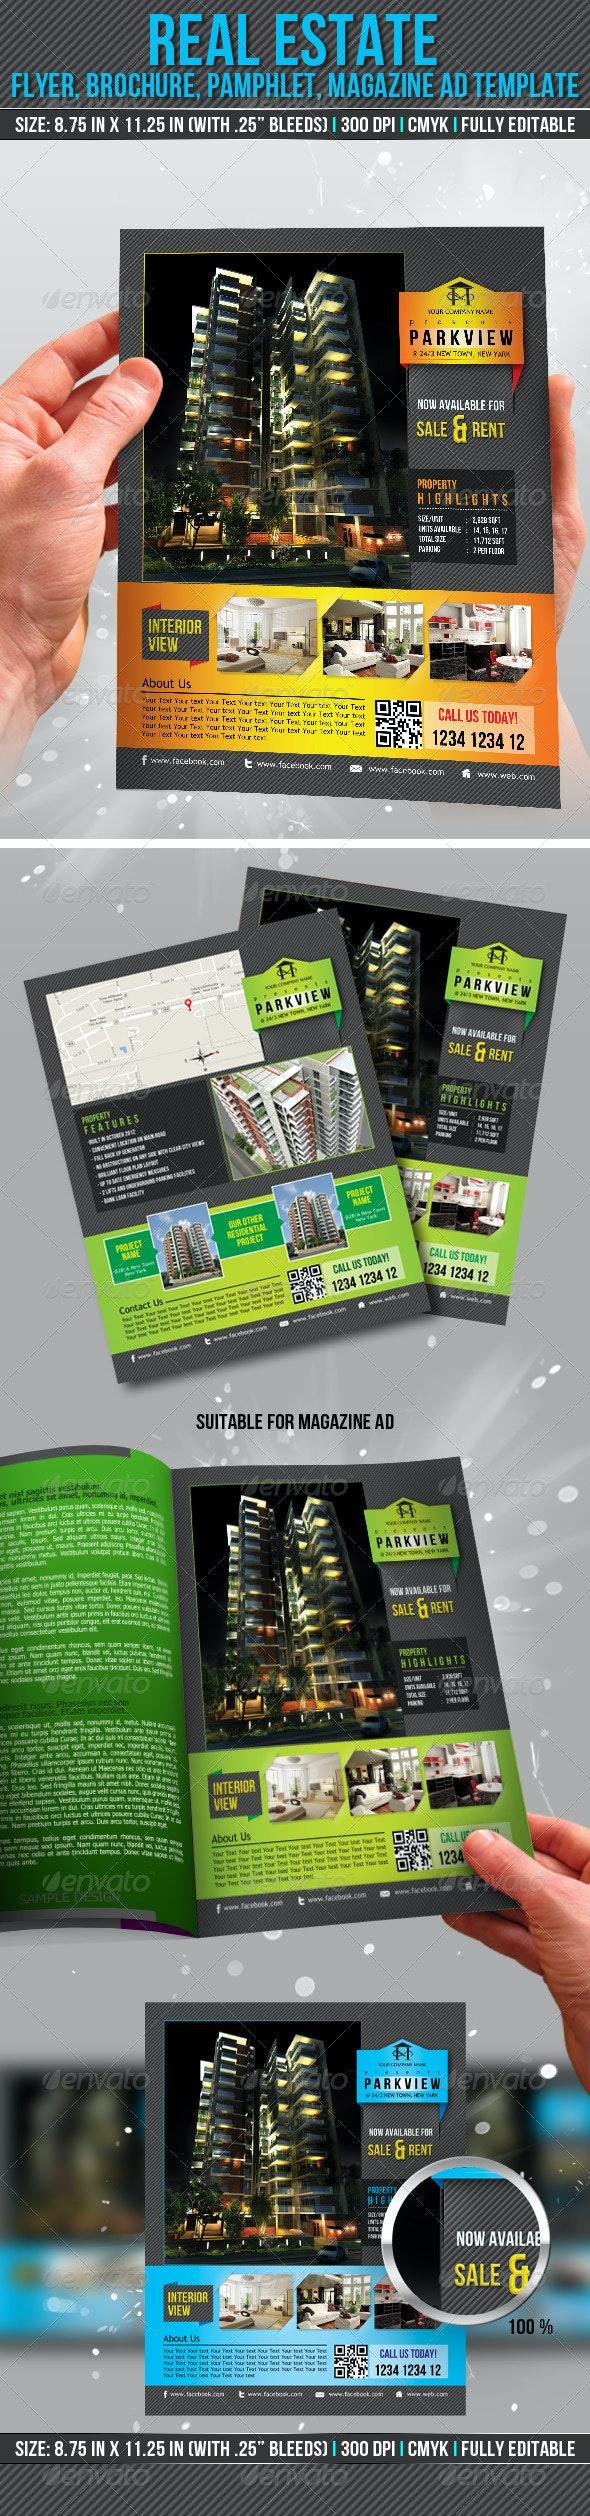 Real Estate Flyer, Brochure, Pamphlet, Magazine Ad - Print Templates